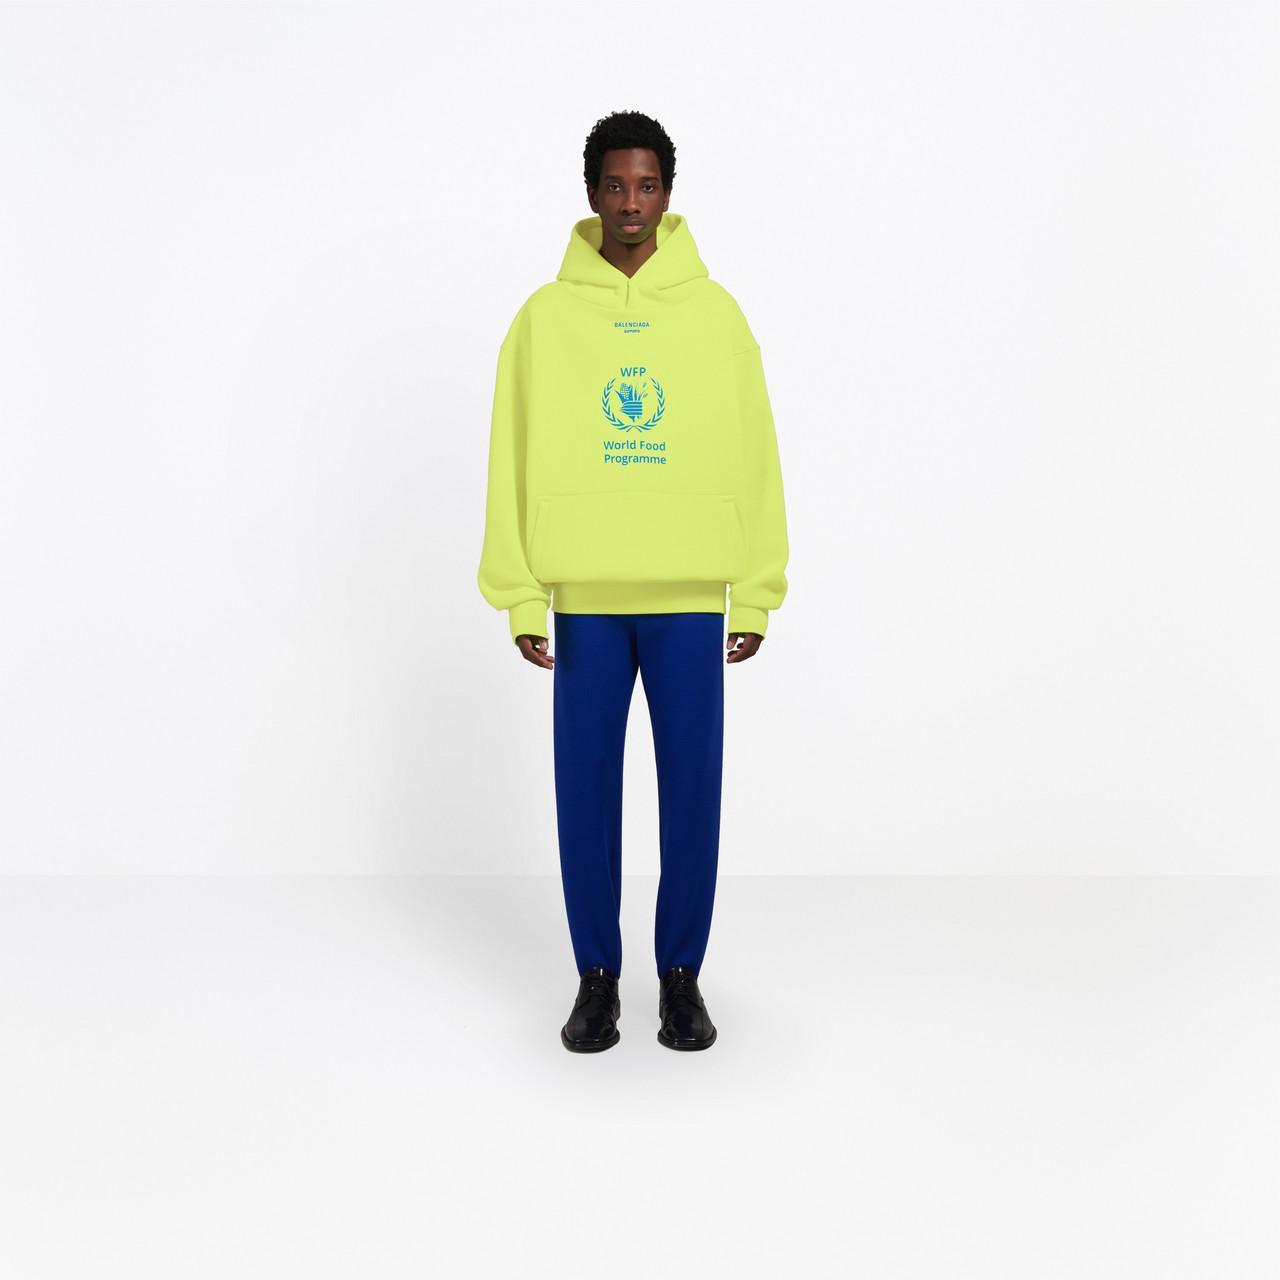 Lyst En Afficher Sweat Plein For Yellow Écran A Programme Balenciaga Men Capuche Food World gFPZvqx